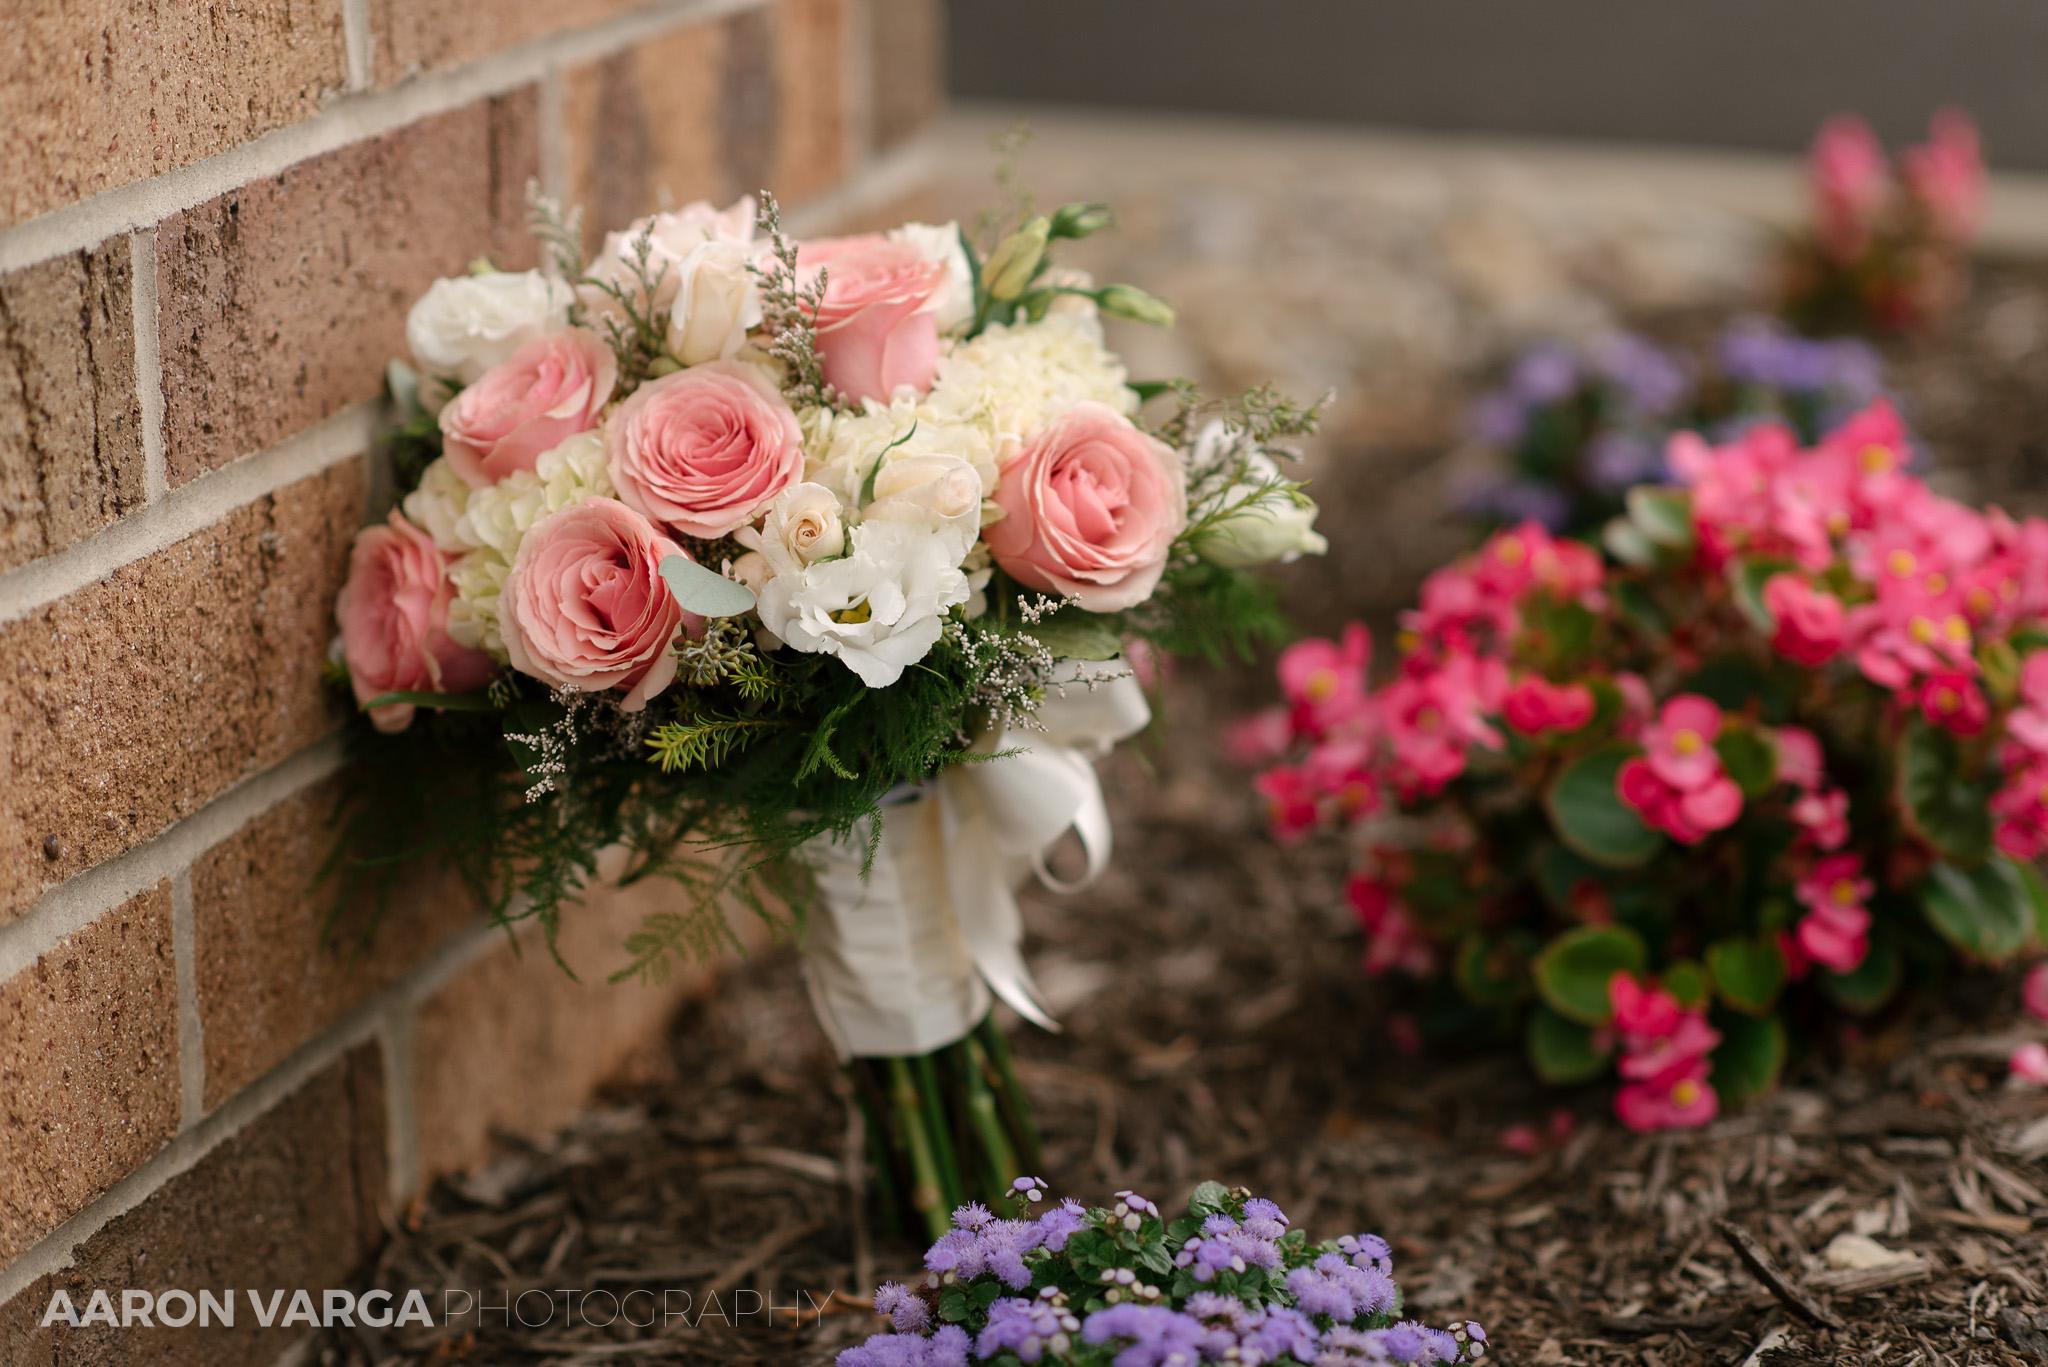 Best wedding photos of 2017 flowers 33 summer wedding bouquet flowers pink white best of 2017 flowers izmirmasajfo